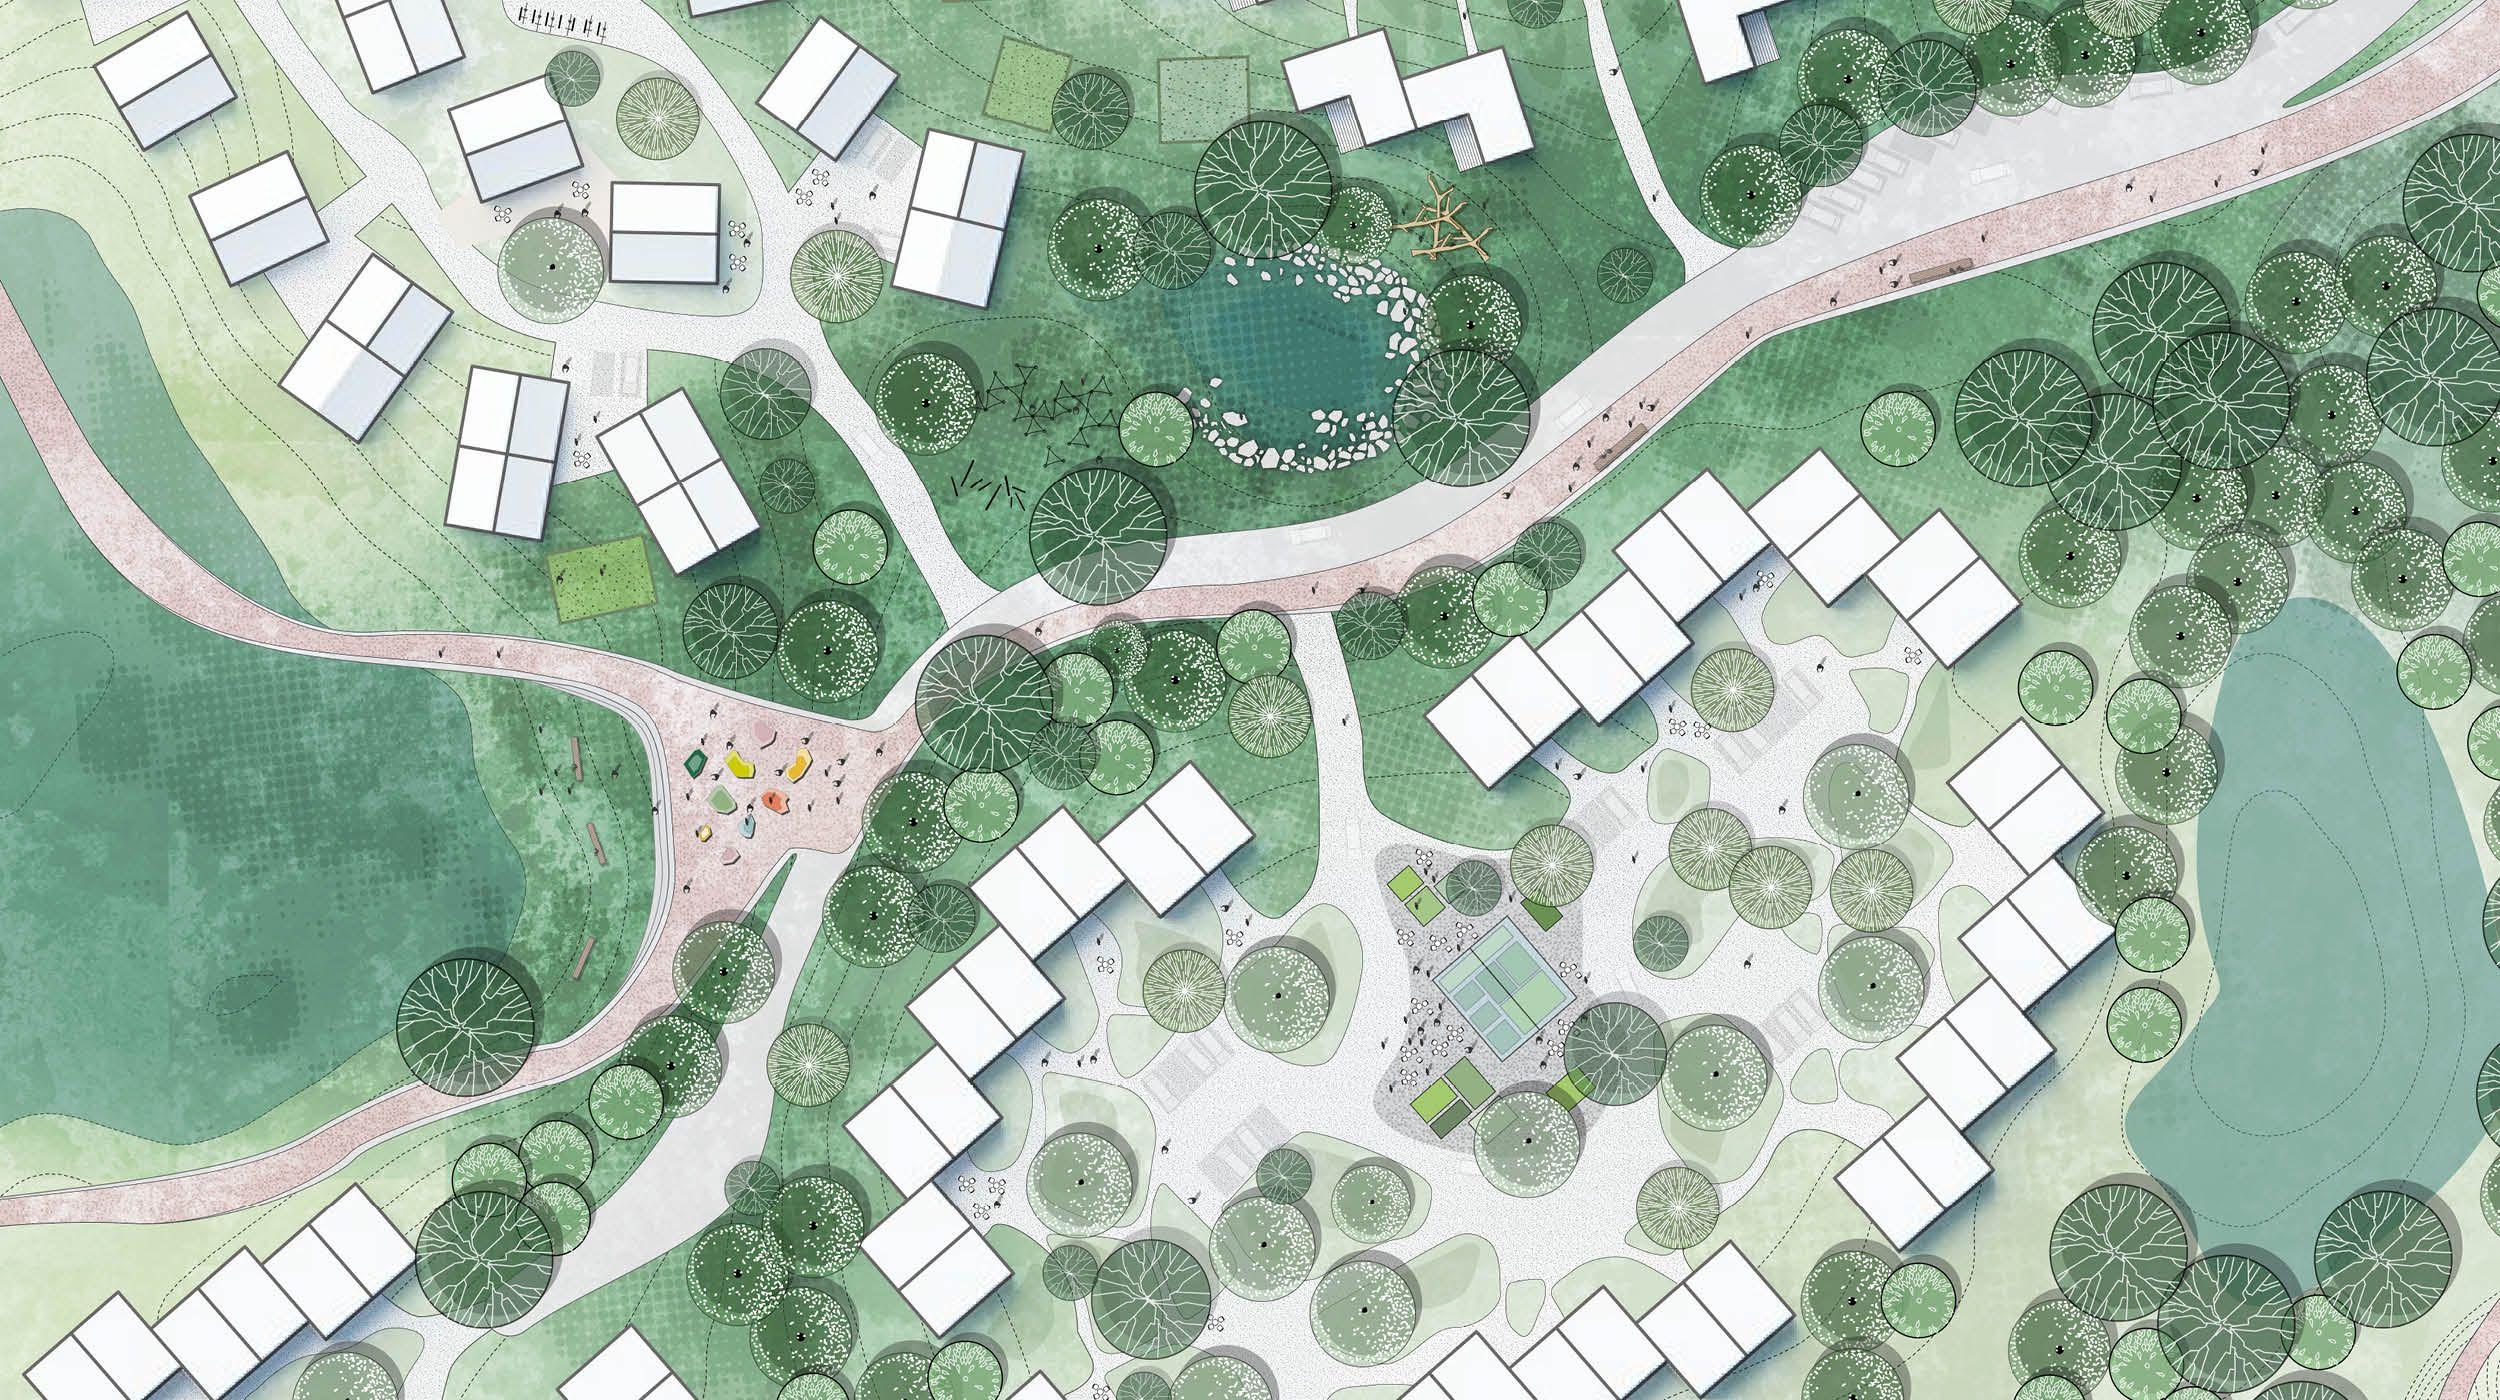 Hel40 Jpg Architecture Graphics Urban Planning City